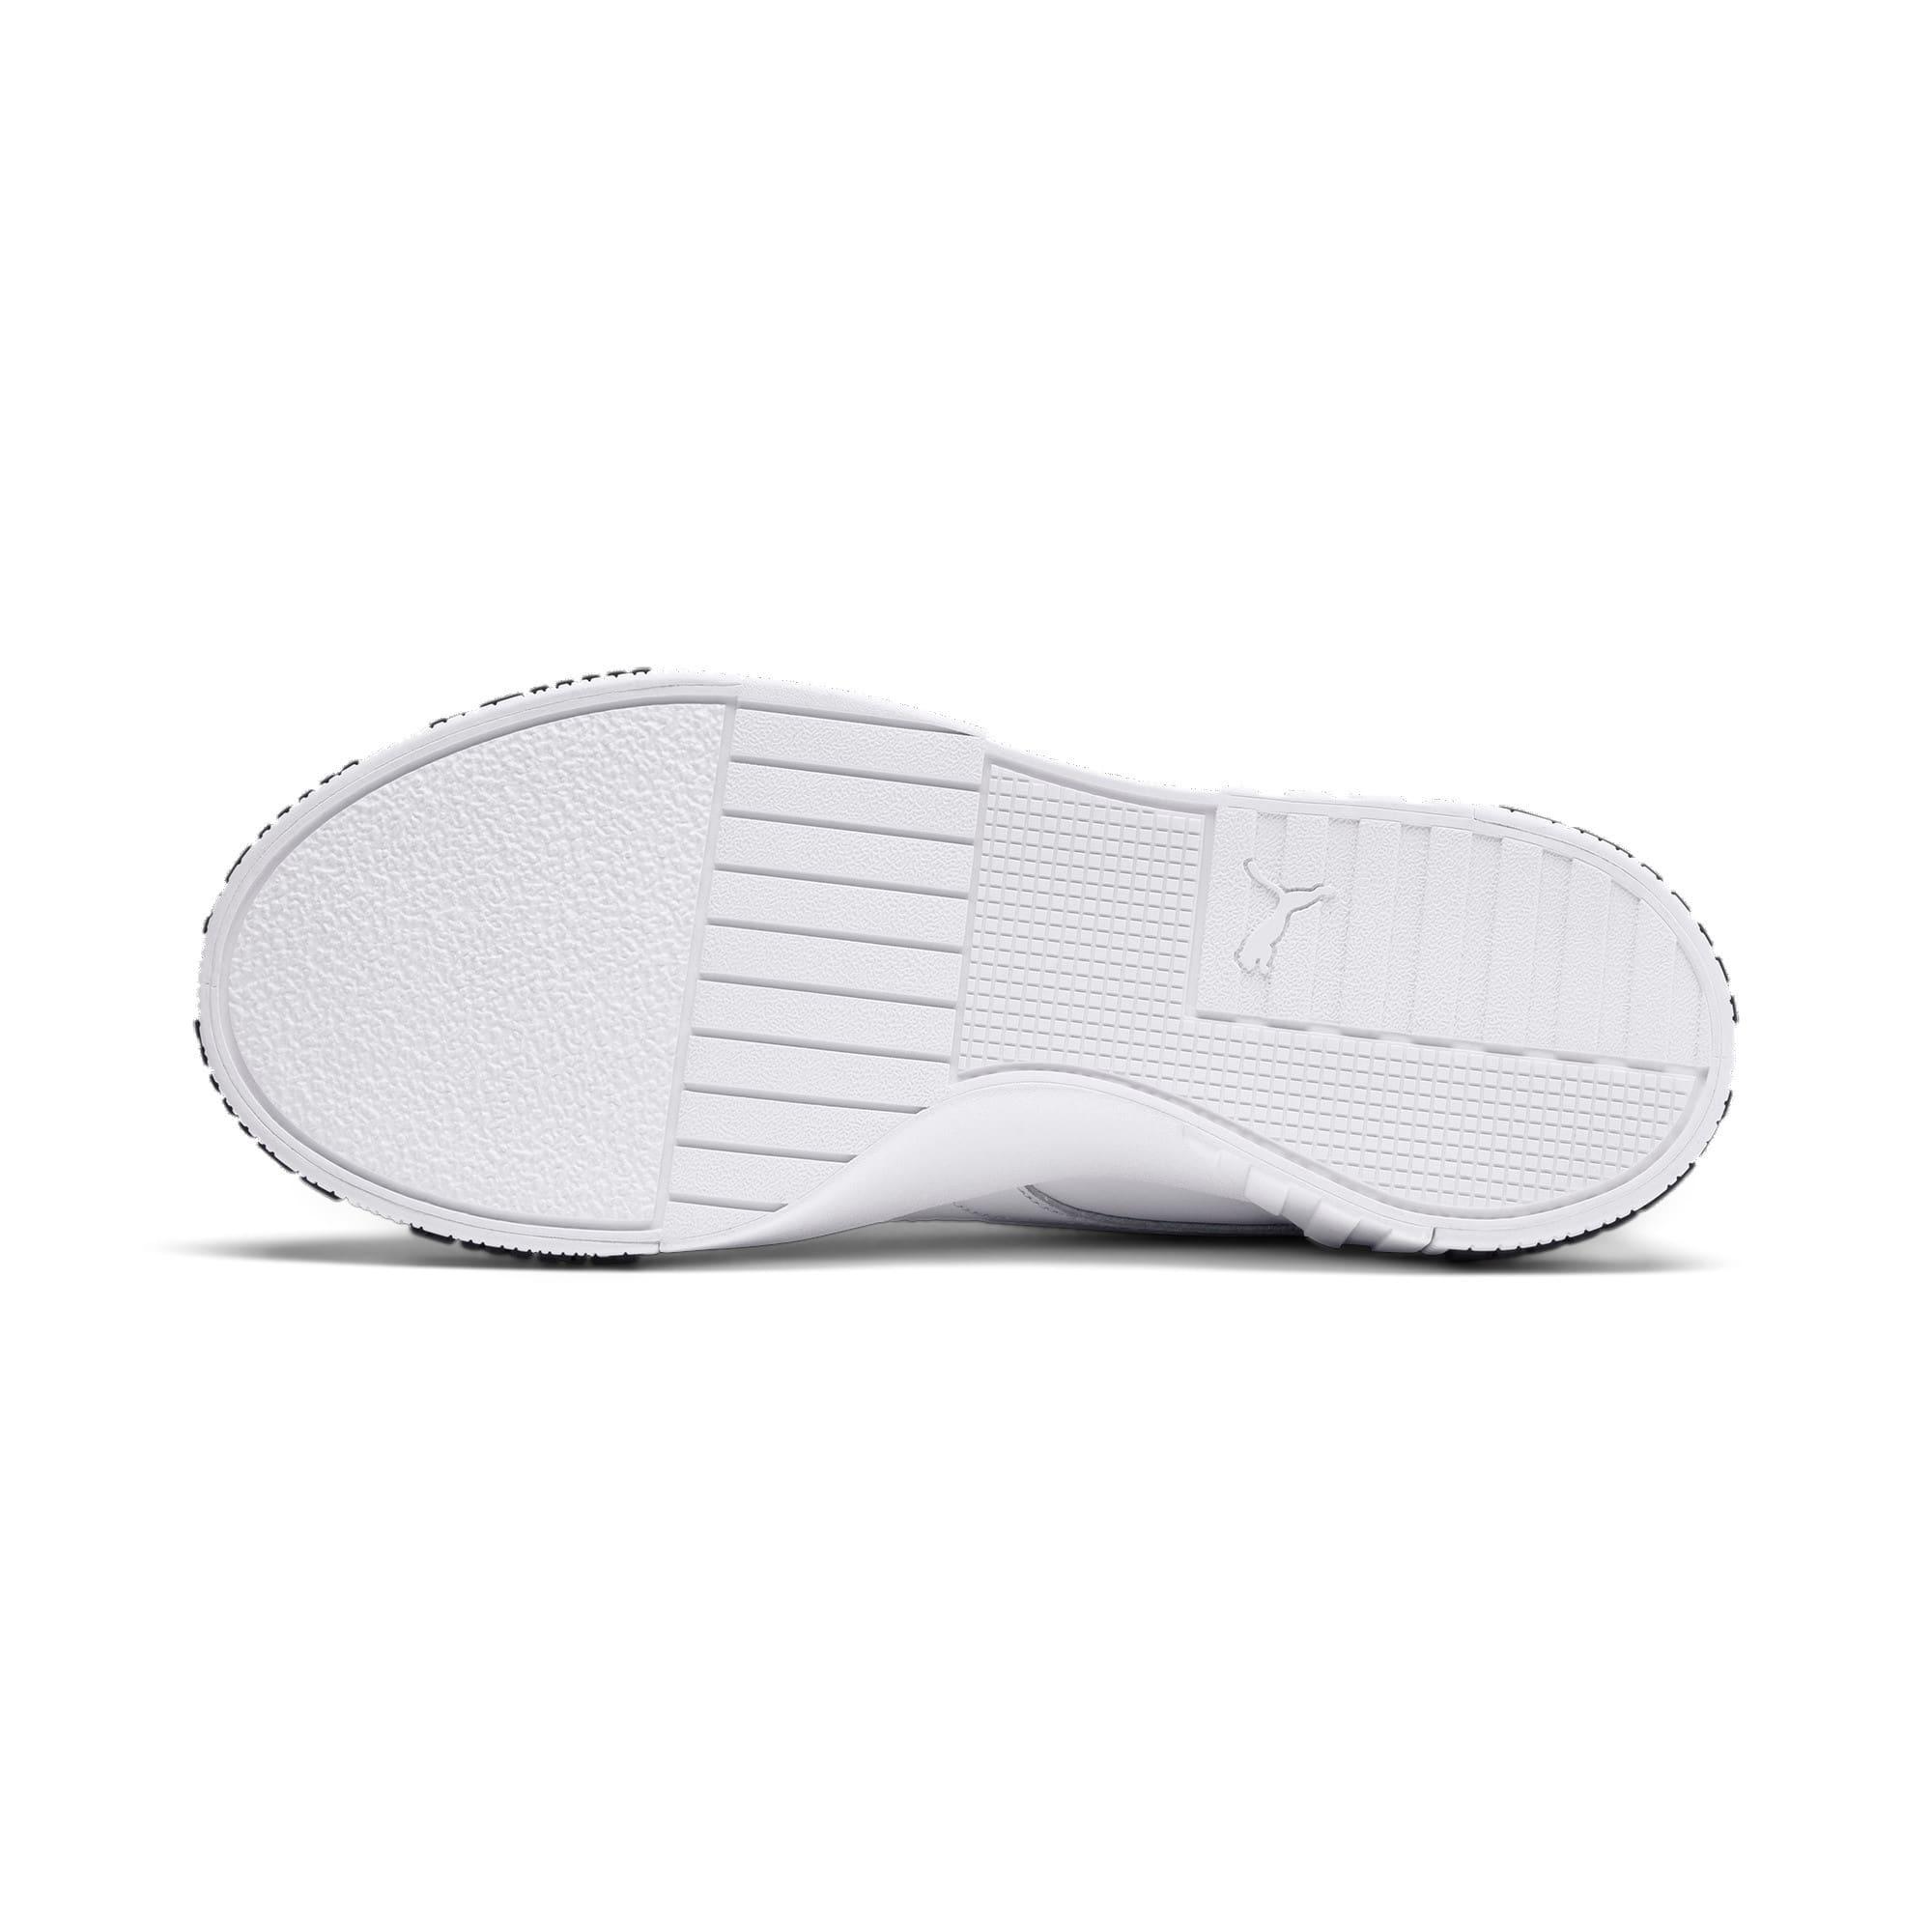 Thumbnail 5 of Cali Bold Women's Sneakers, Puma White-Metallic Gold, medium